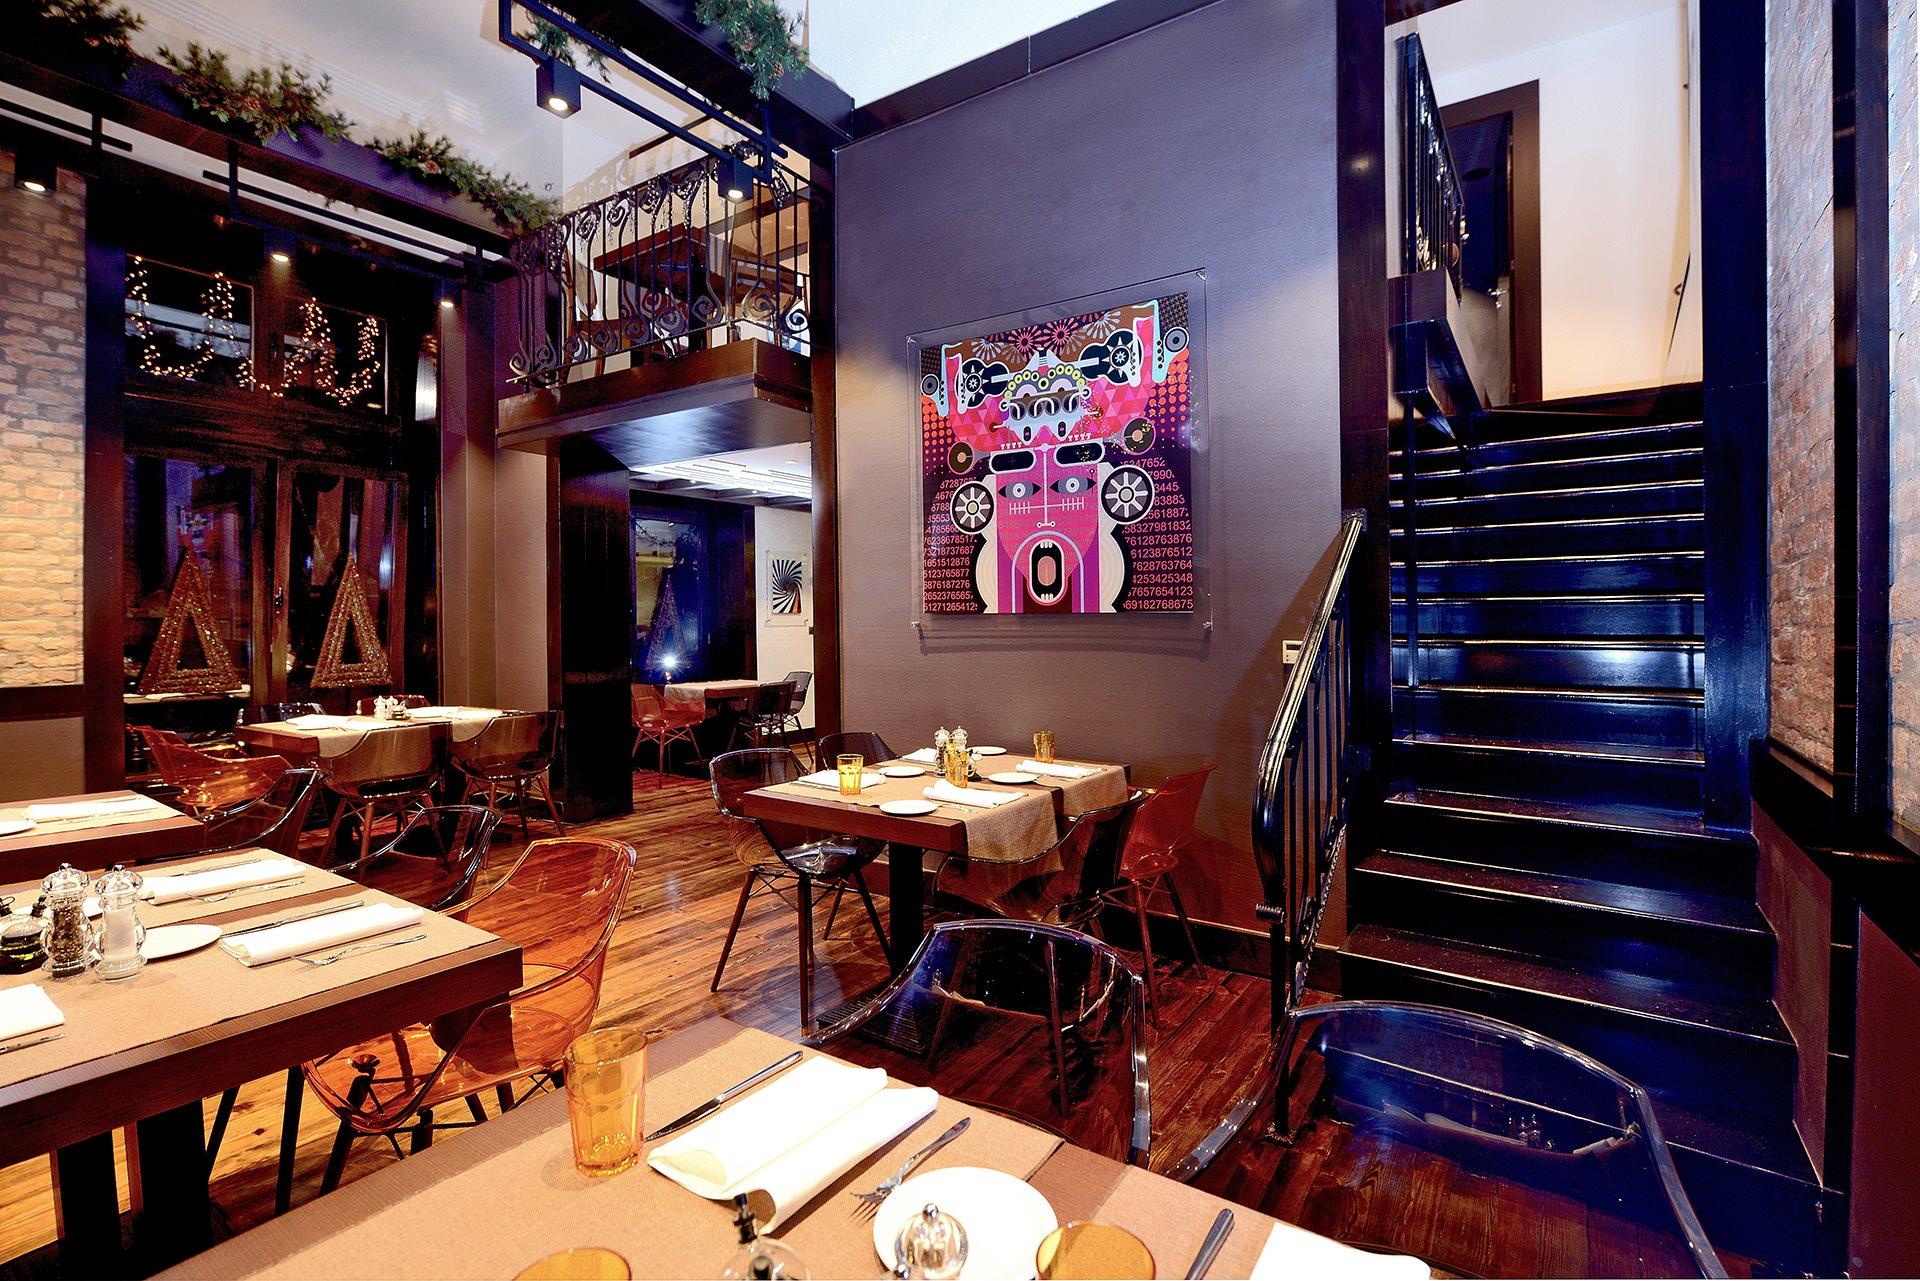 Restoran Mentalitet Kralja Petra 70 Beograd Dorćol